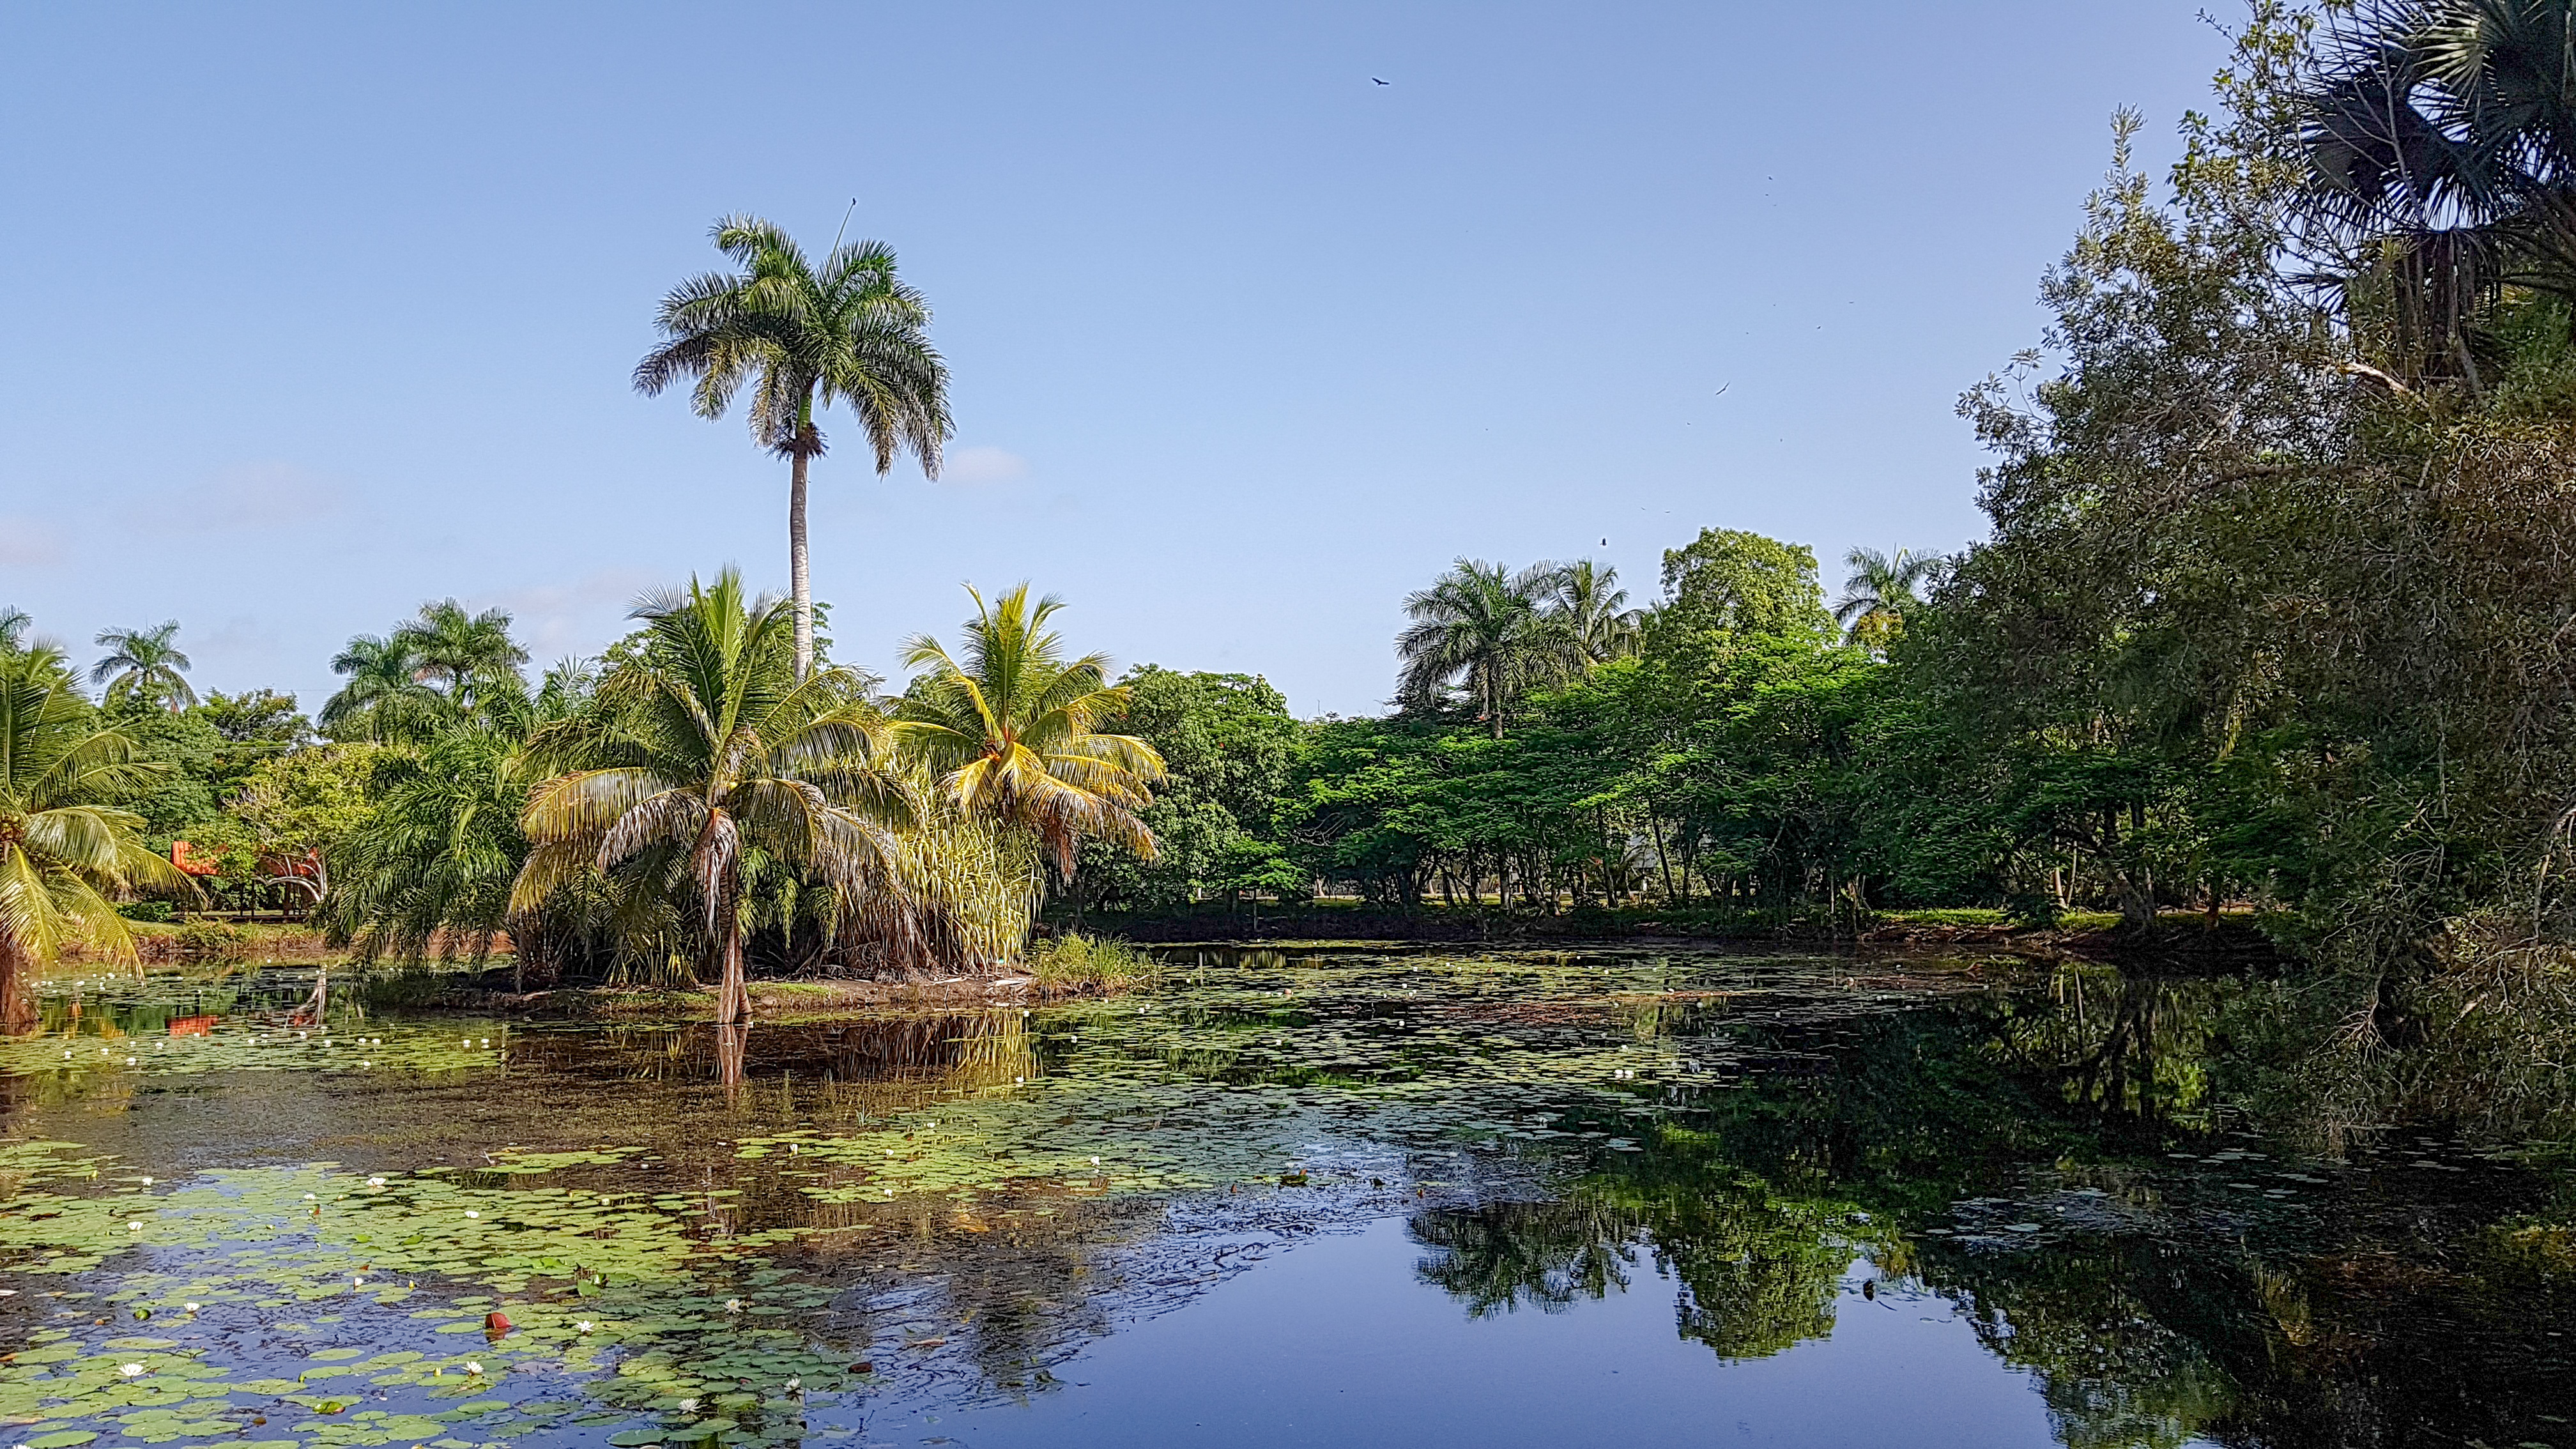 La ferme aux crocodiles, Playa Larga, Cuba